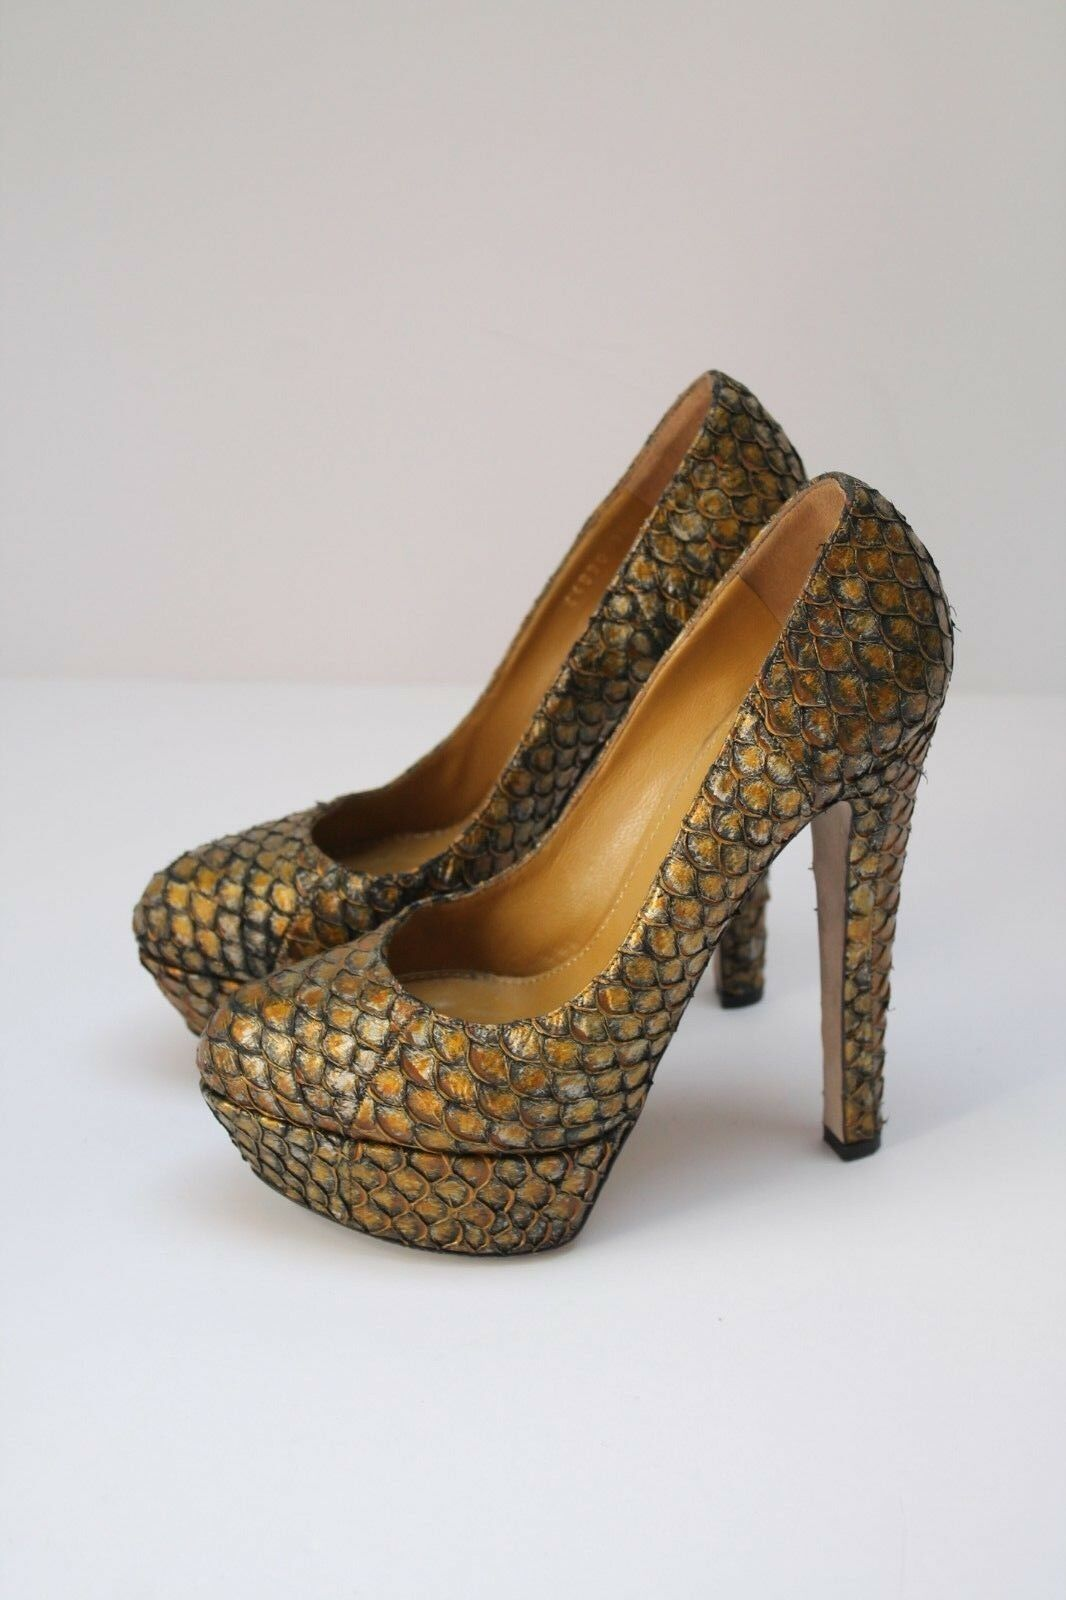 Sergio Rossi Snake Skin Platform Heels, Größe 3 UK 36 EU